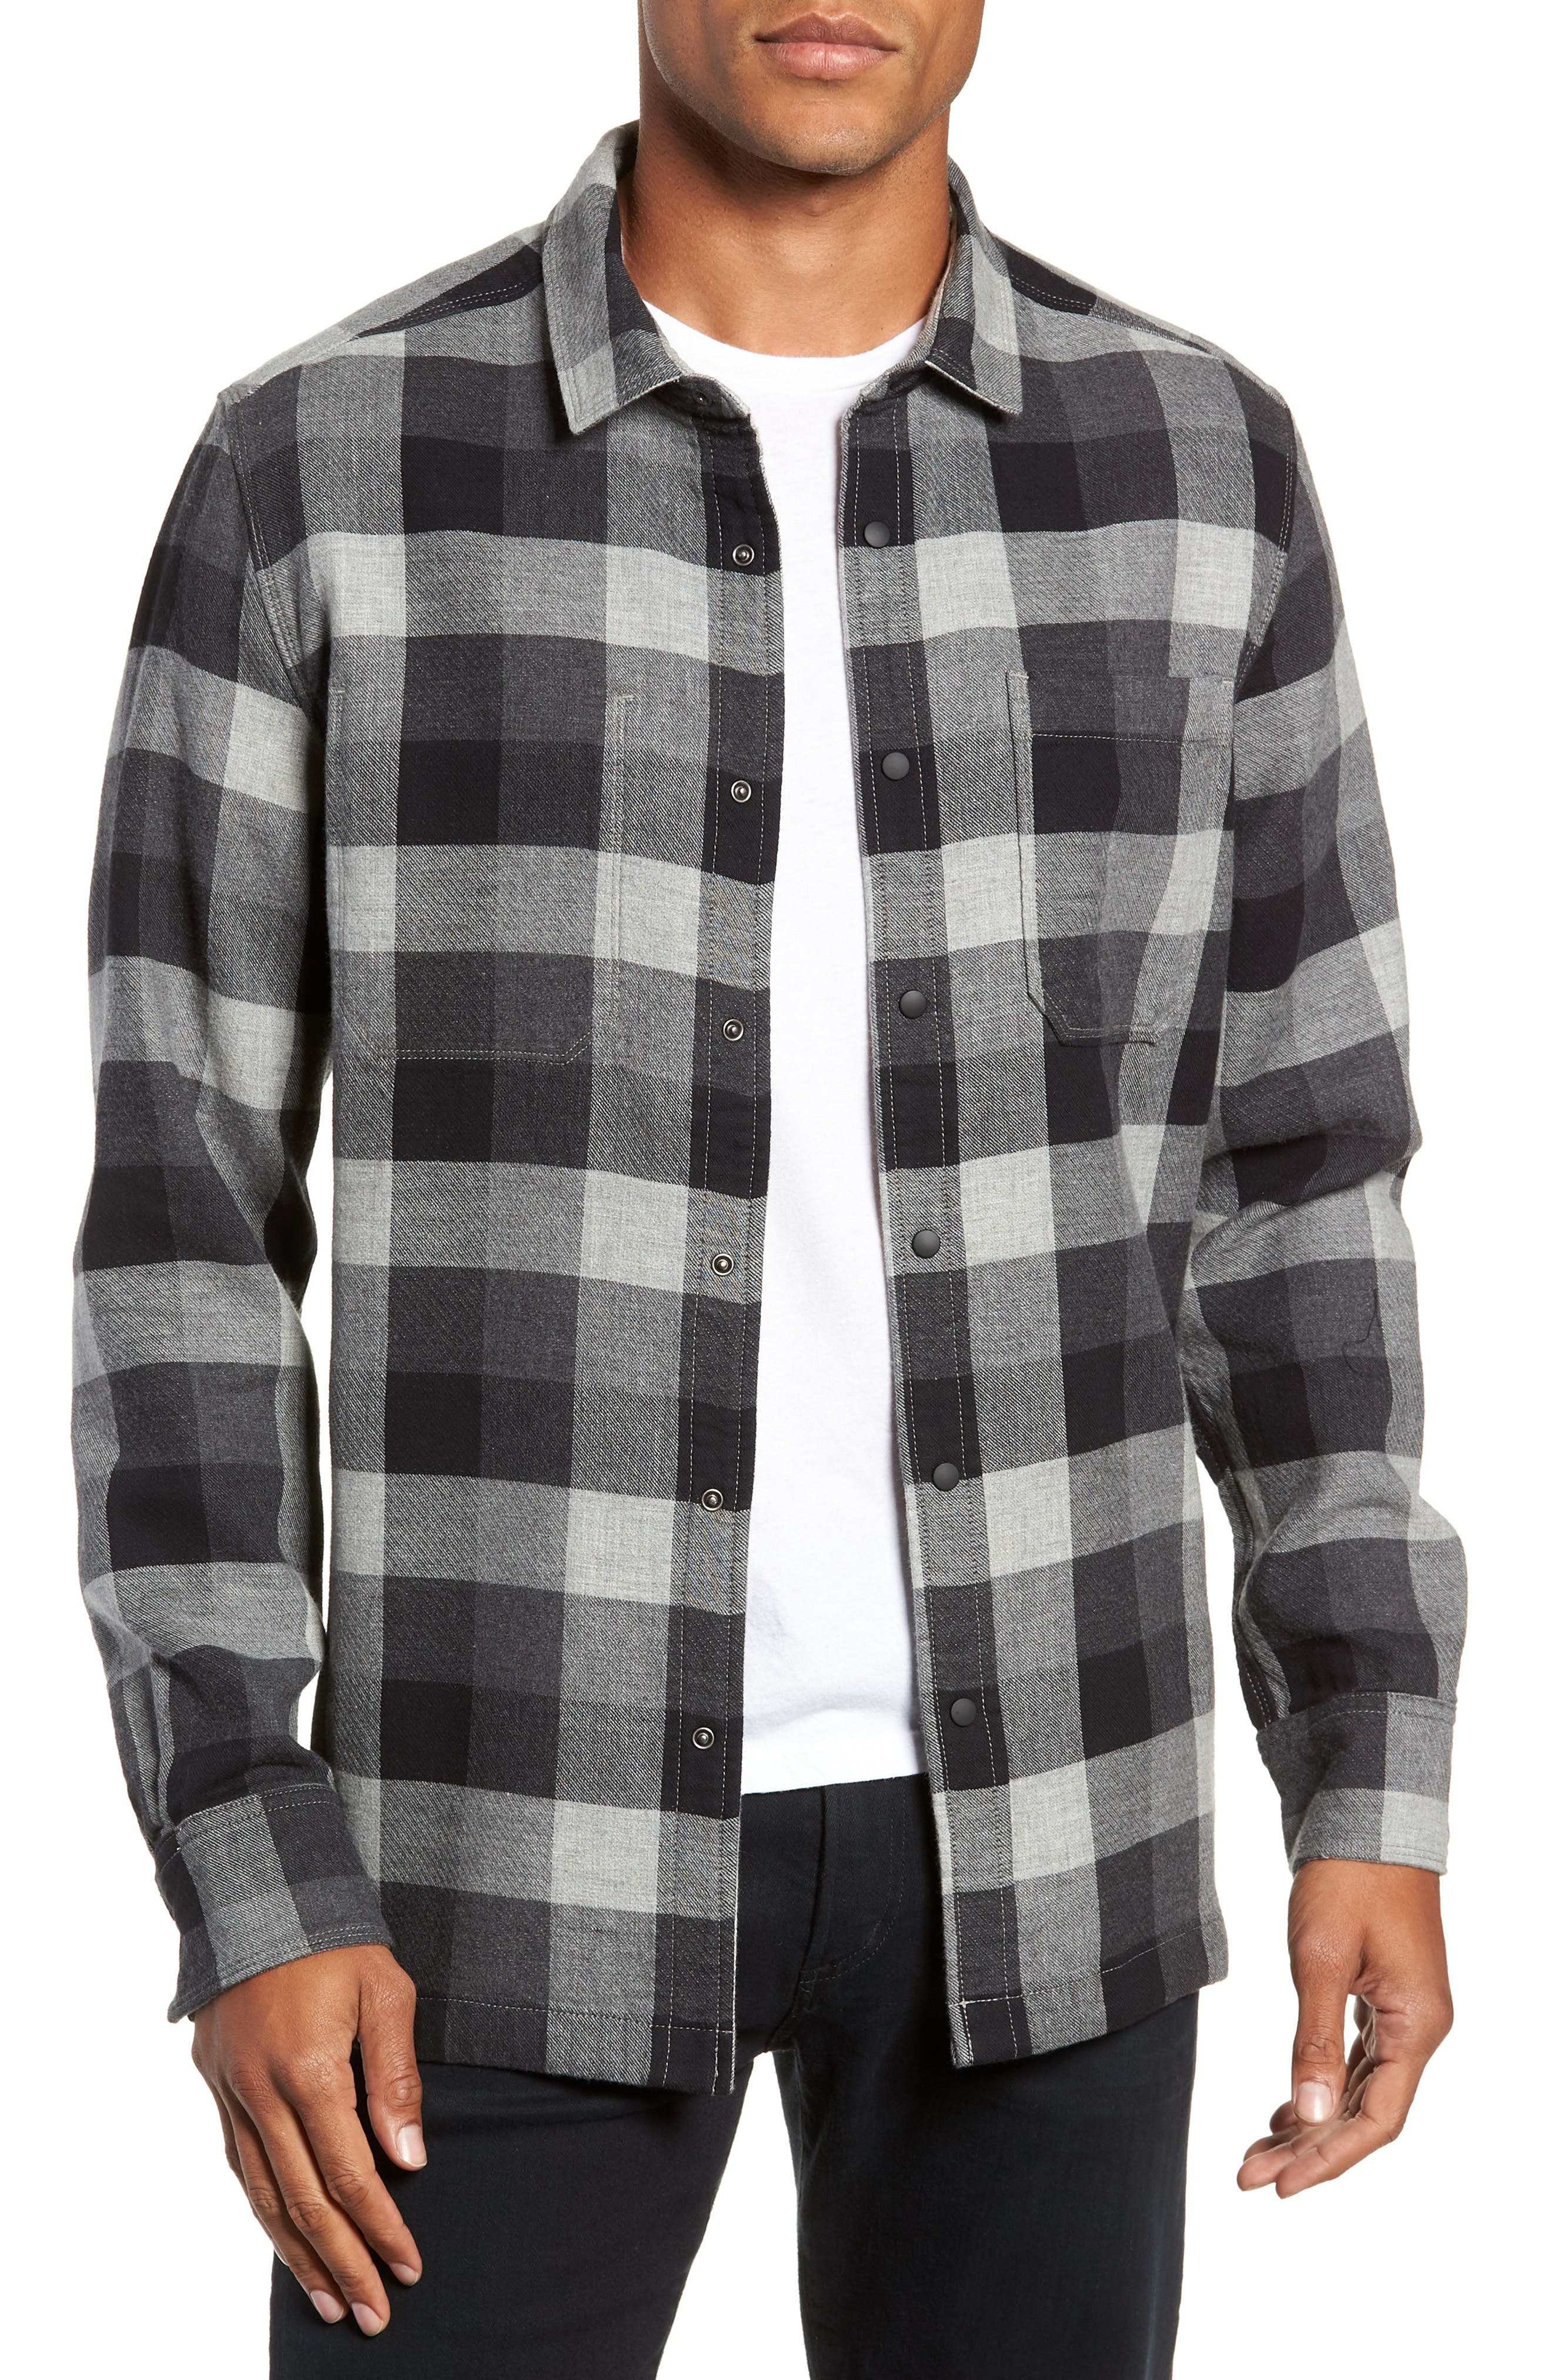 Jeremiah Travis Regular Fit Reversible Flannel Shirt Jacket, Grey